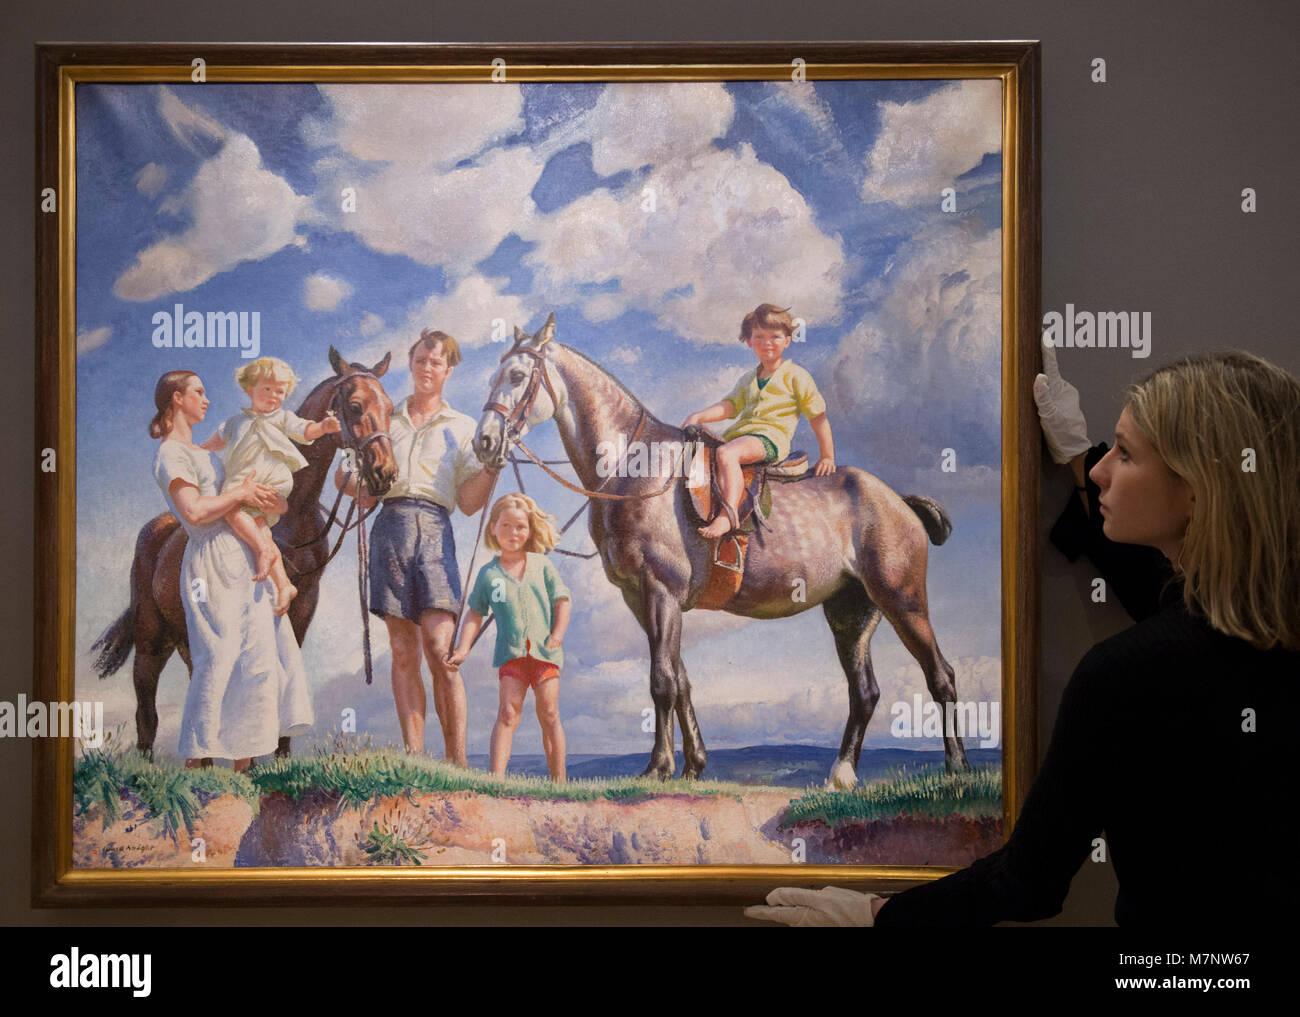 Painting Victorian Imágenes De Stock & Painting Victorian Fotos De ...